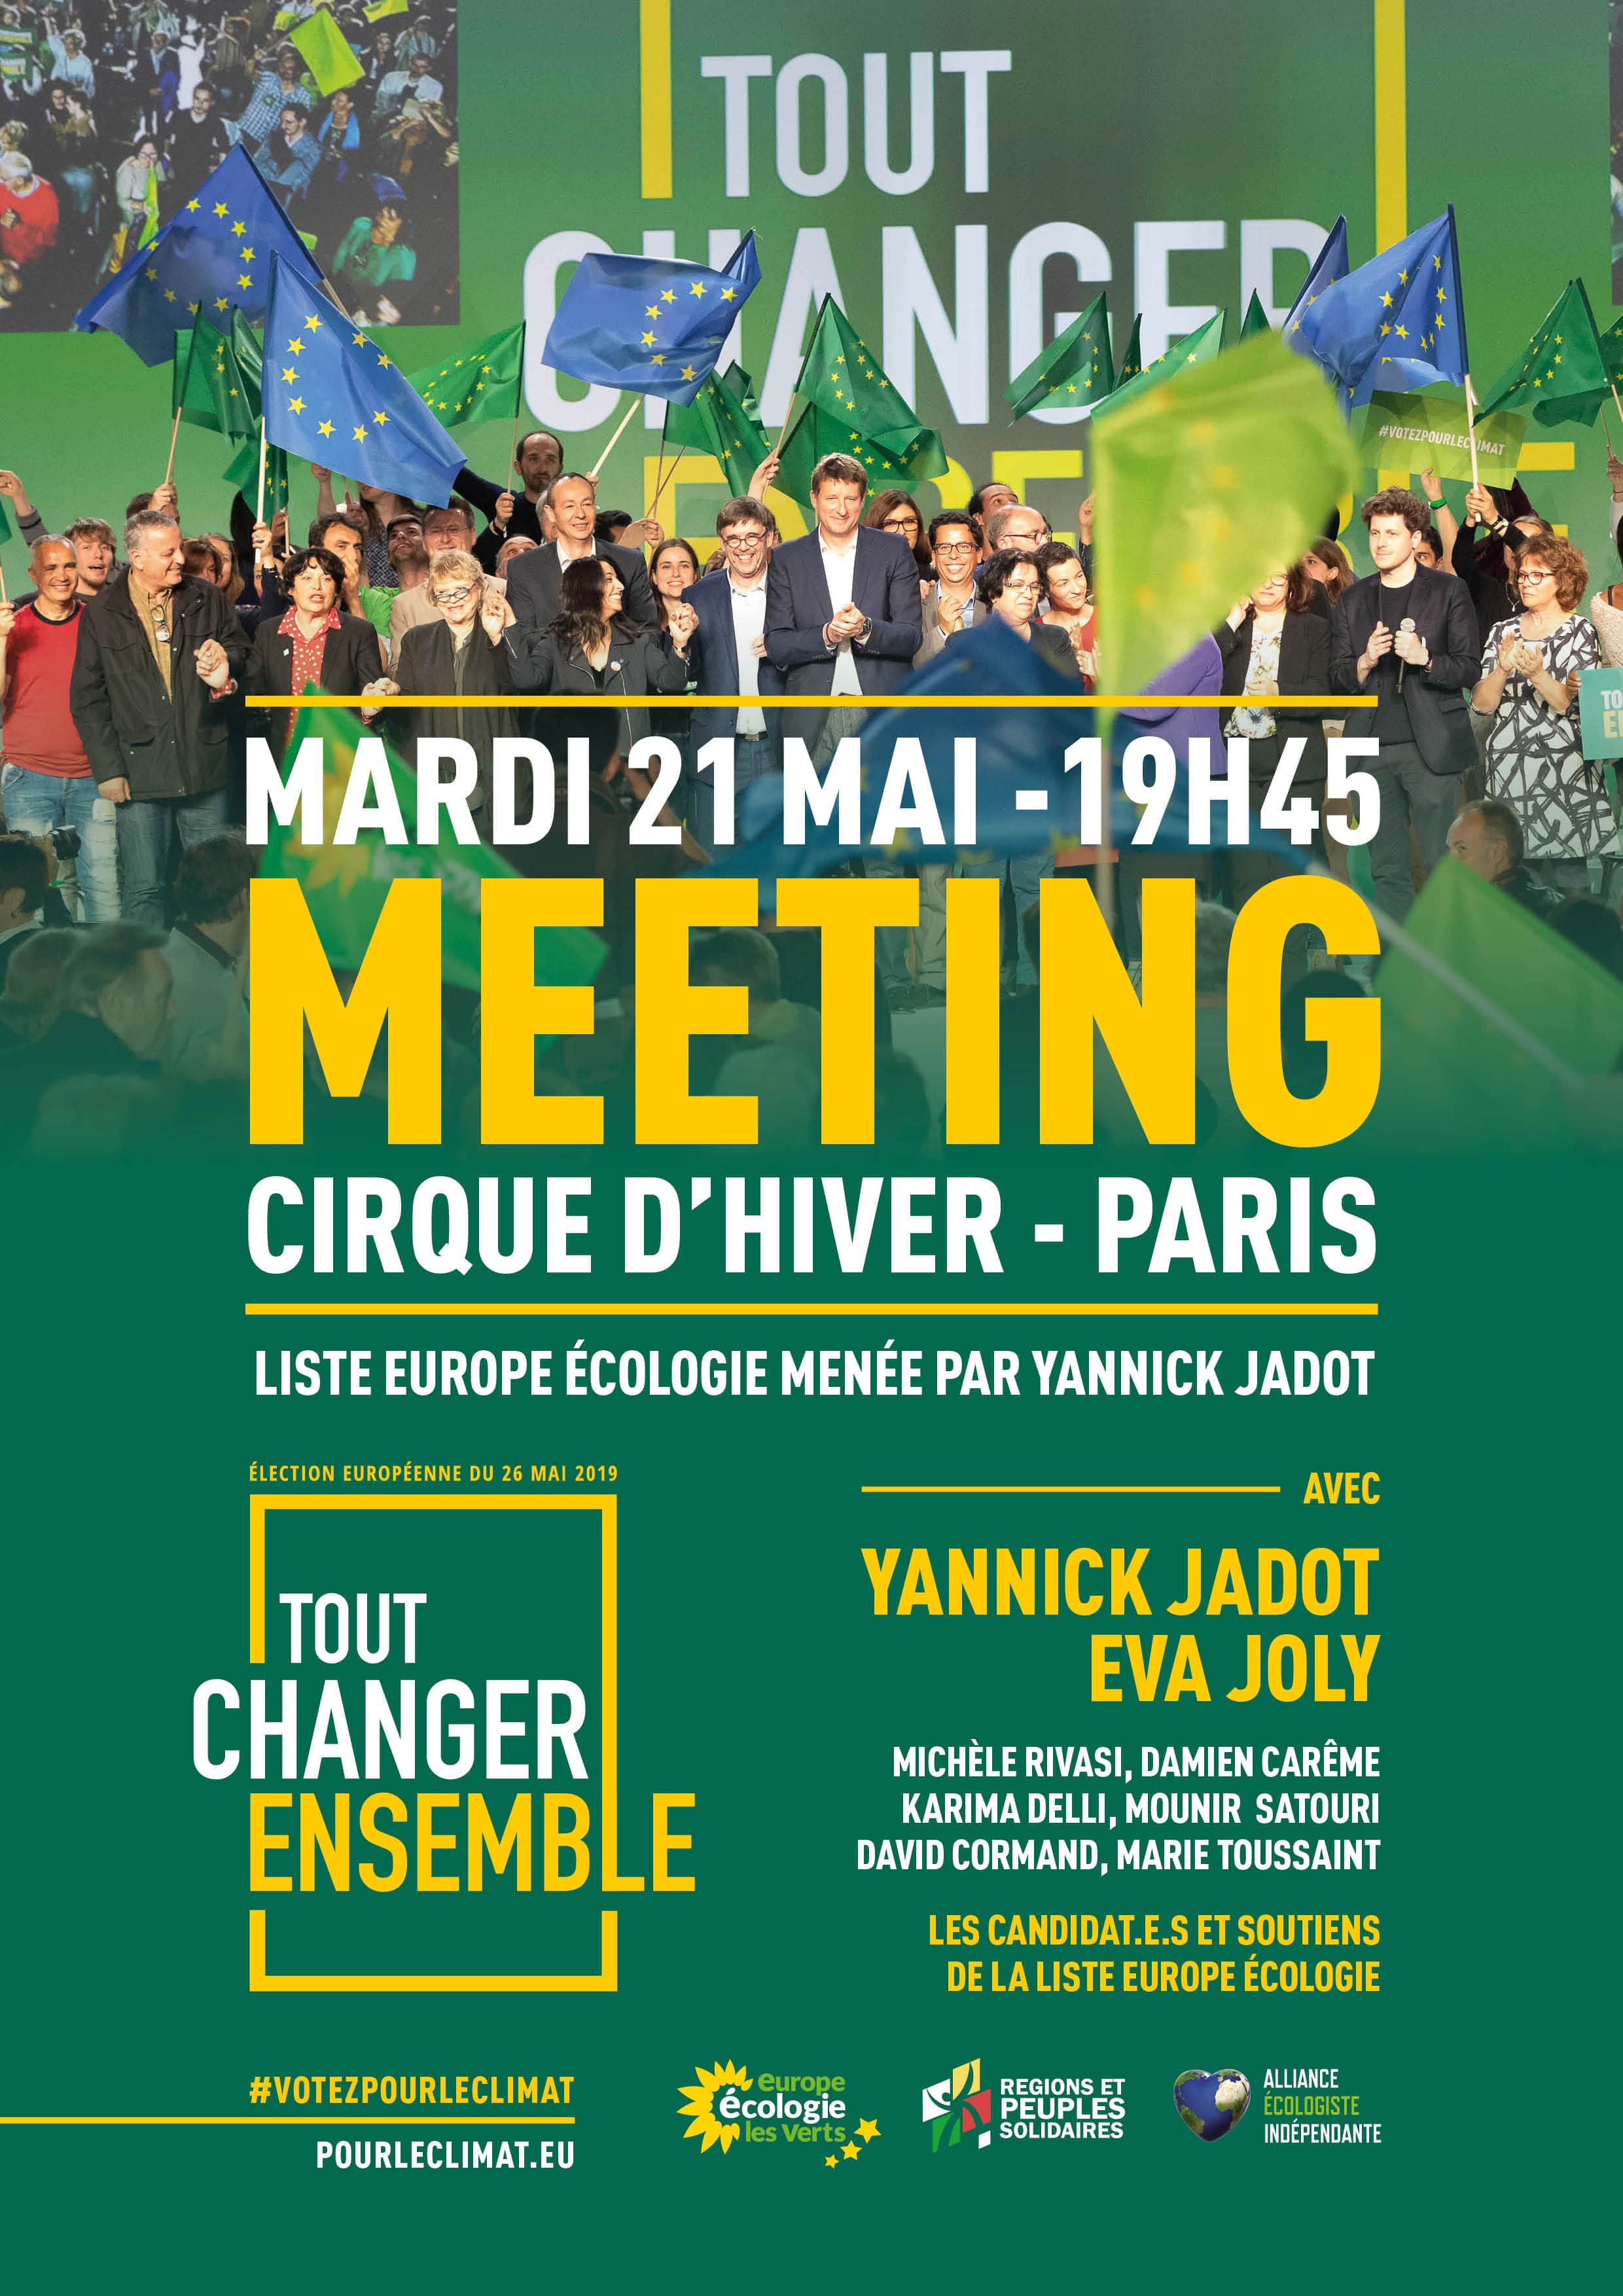 EELV_euro_2019_affiche_A2_meeting_paris_web-min.jpg